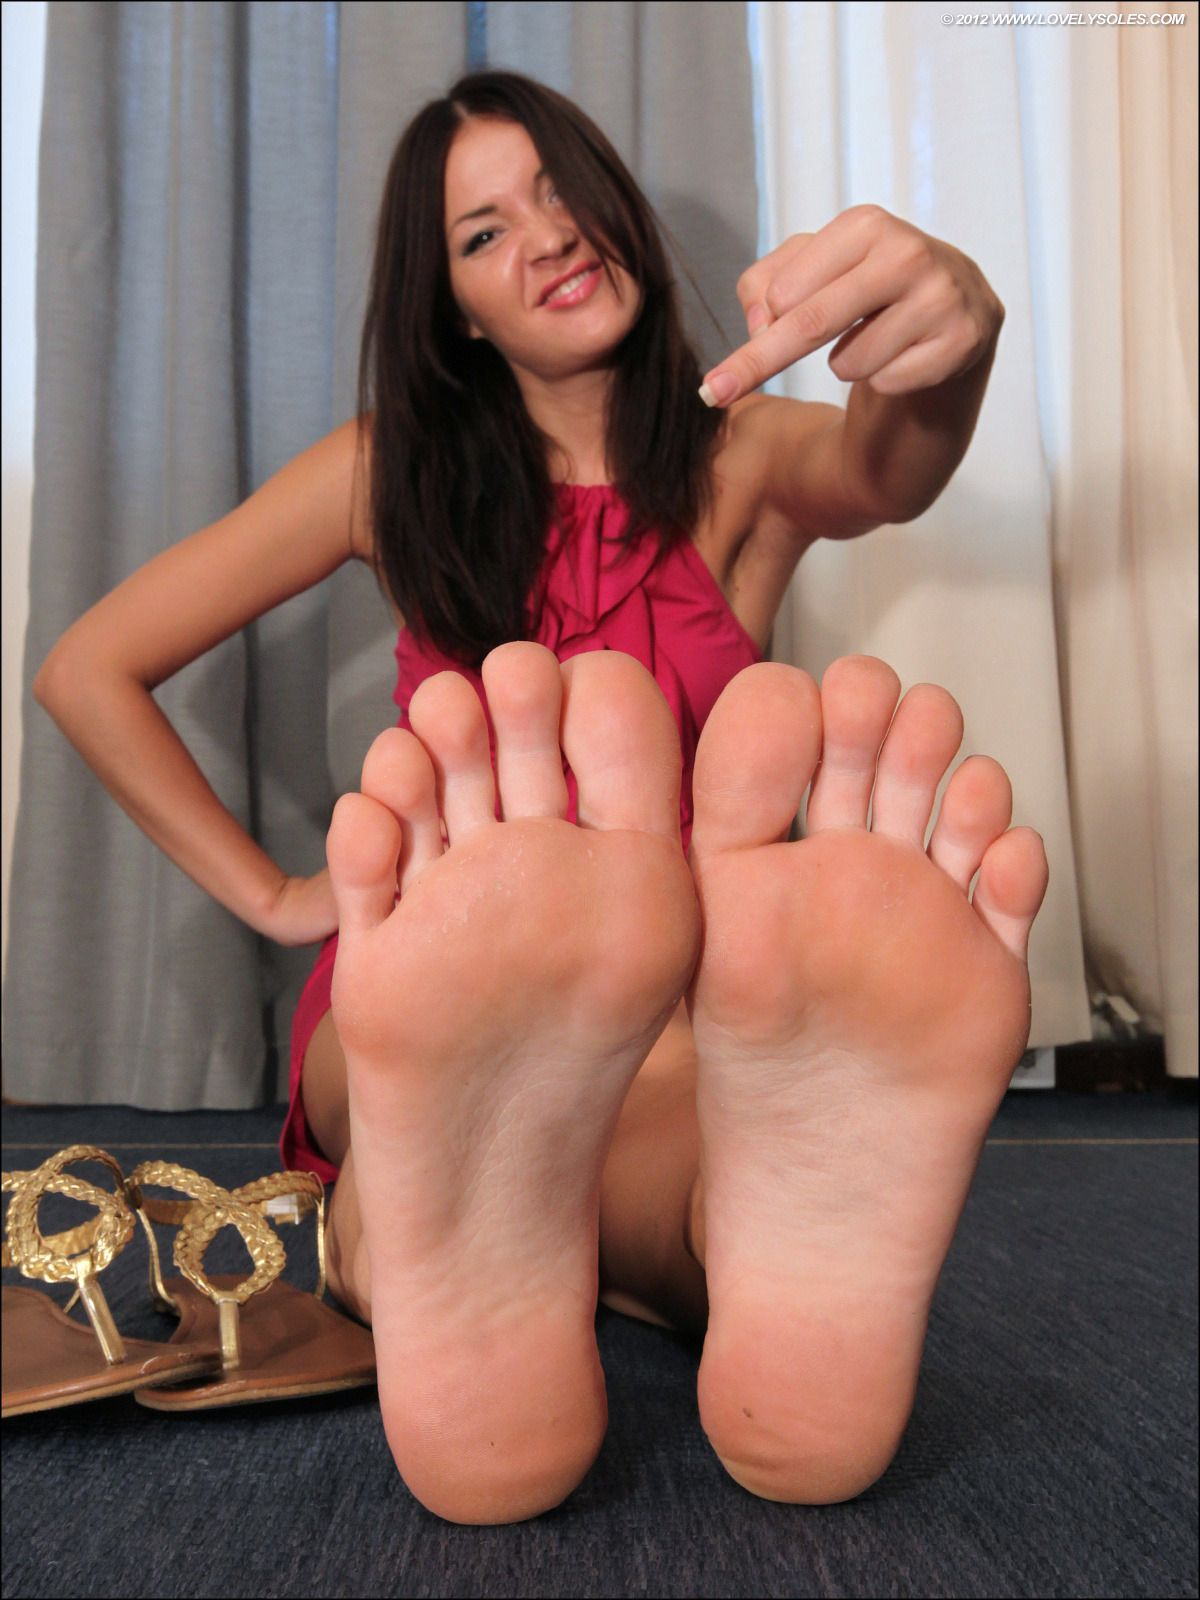 Fucked feet